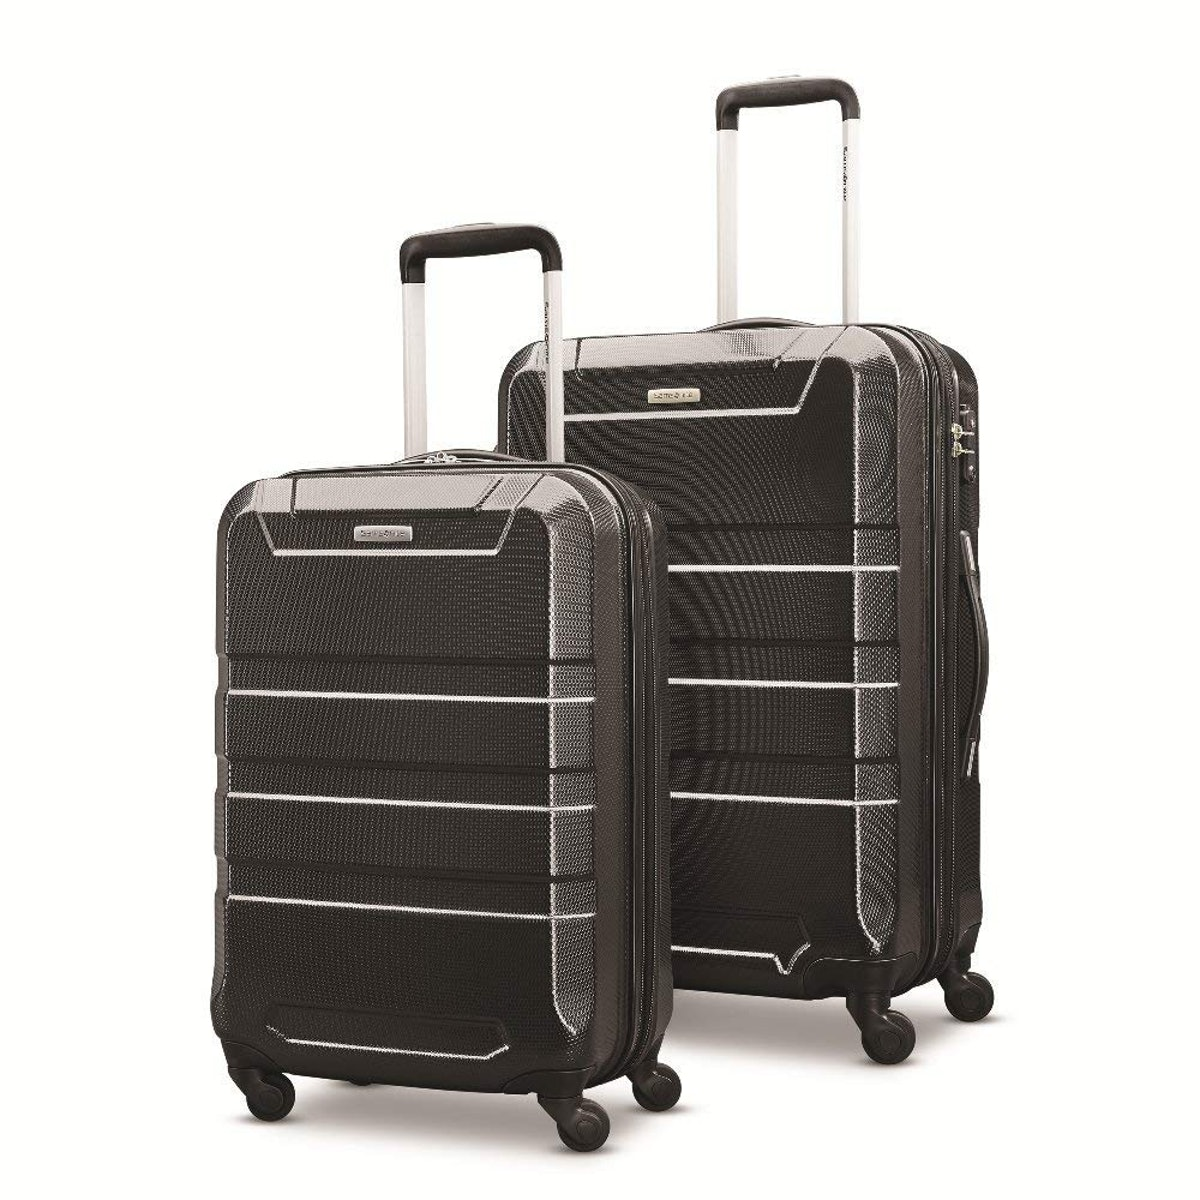 Samsonite 2-Piece Nested Hardside Luggage